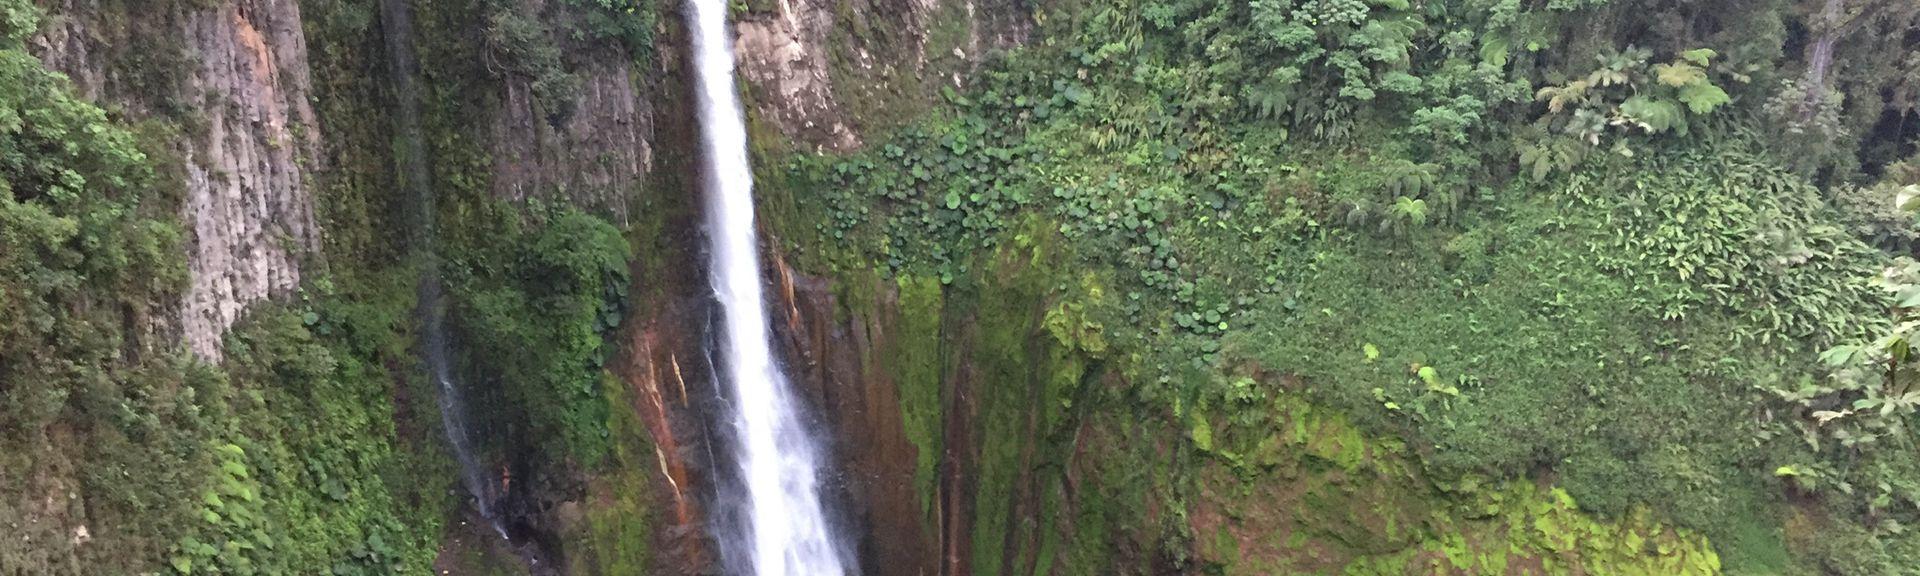 Orotina, Alajuela Province, Costa Rica